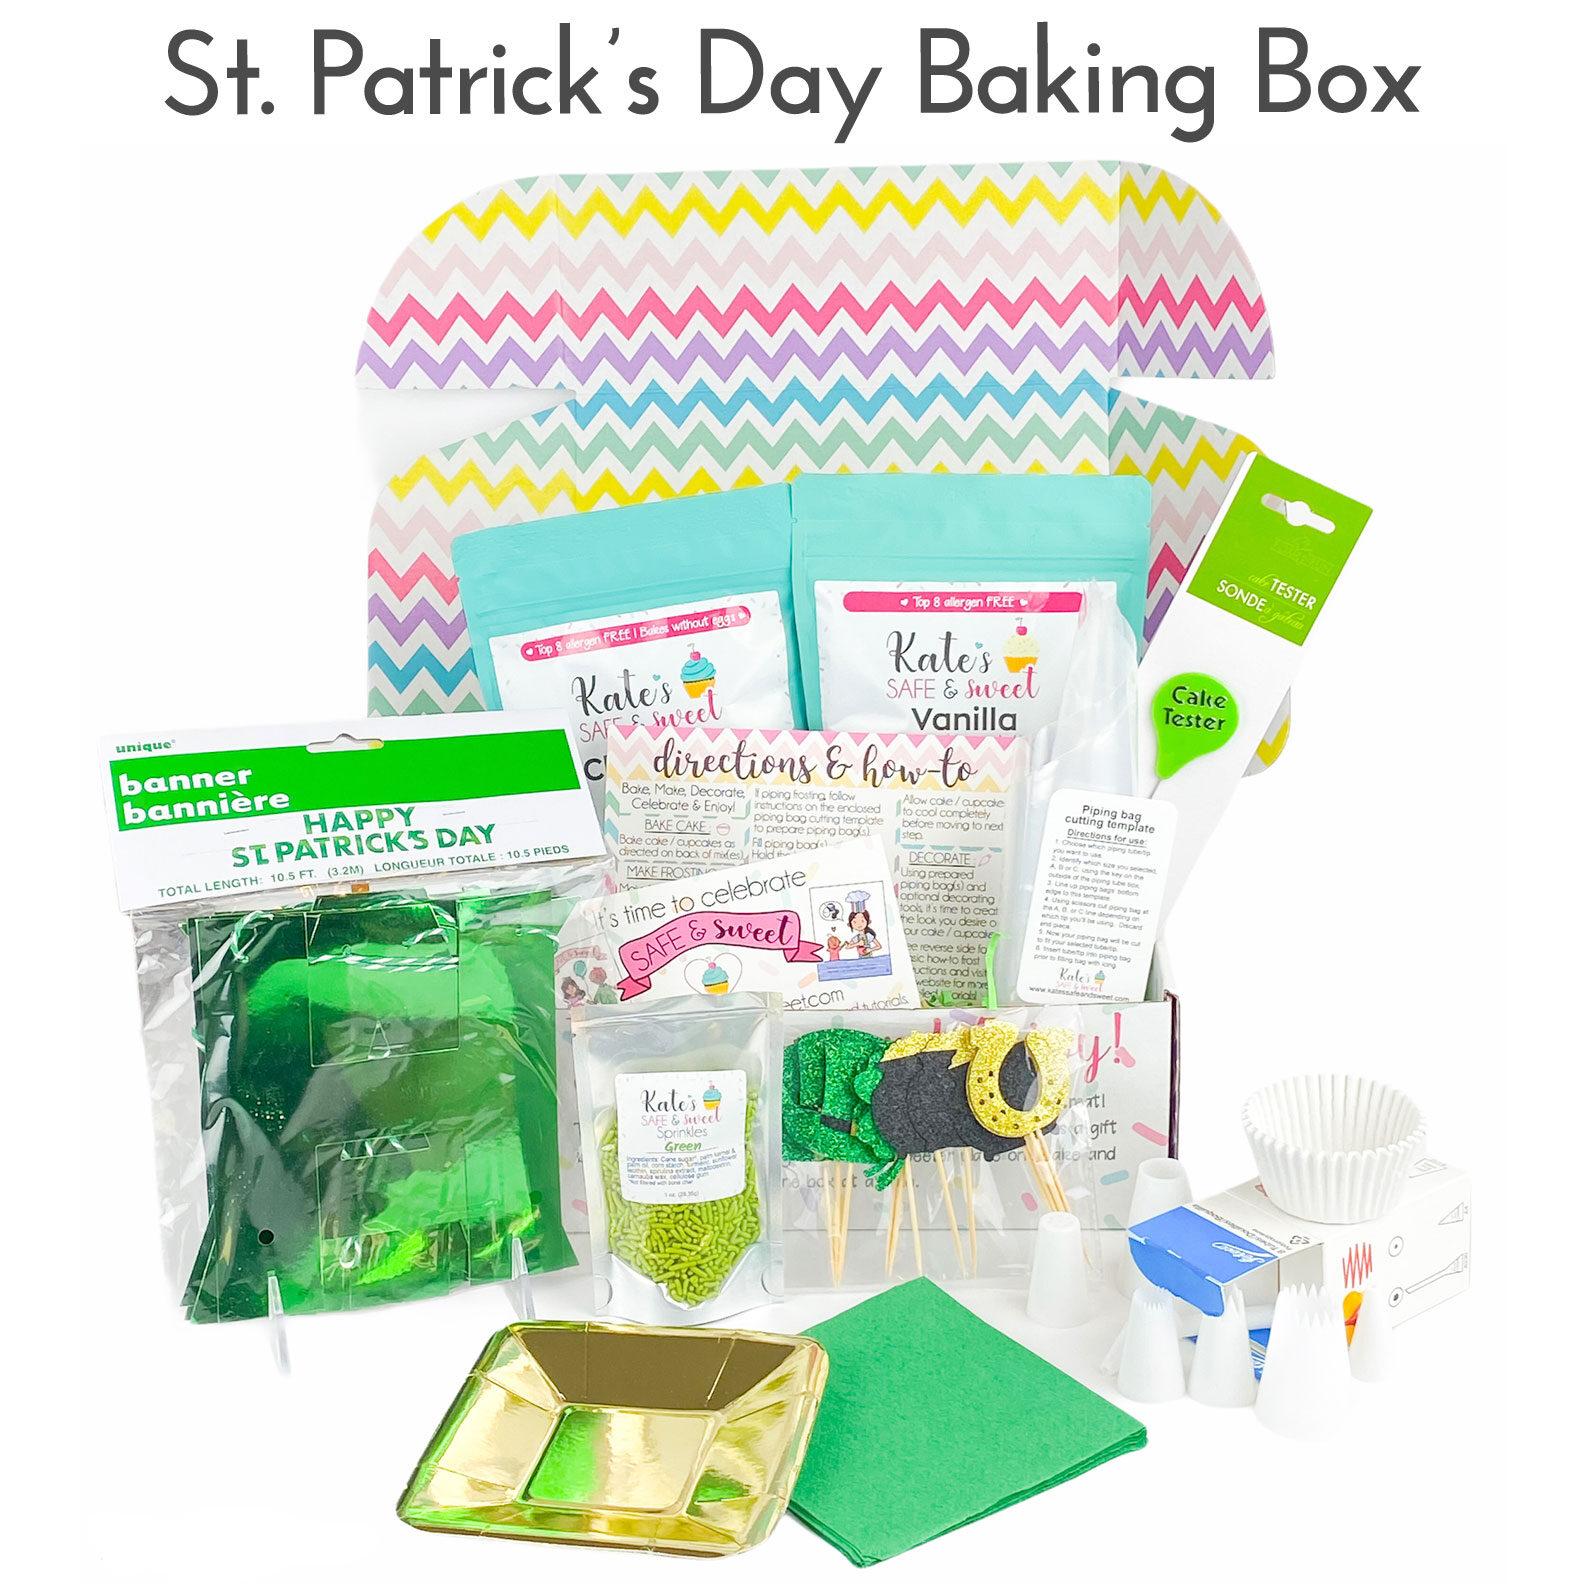 Kate's-Safe-and-Sweet---St.-Patricks-Day-Baking-Box